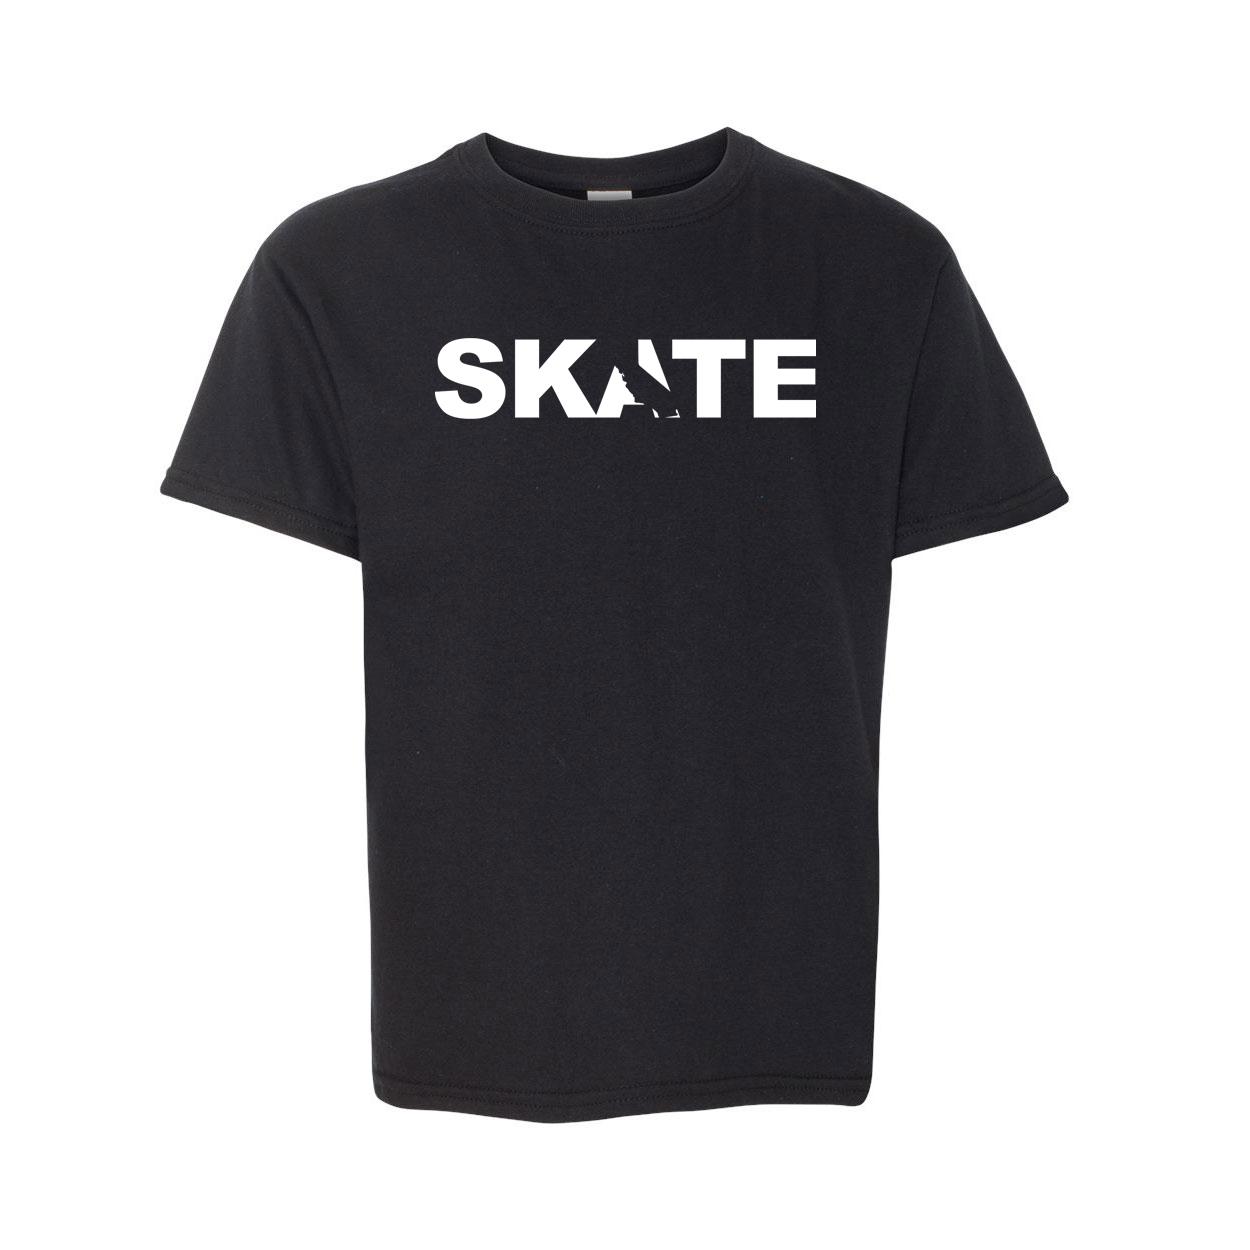 Skate California Classic Youth T-Shirt Black (White Logo)